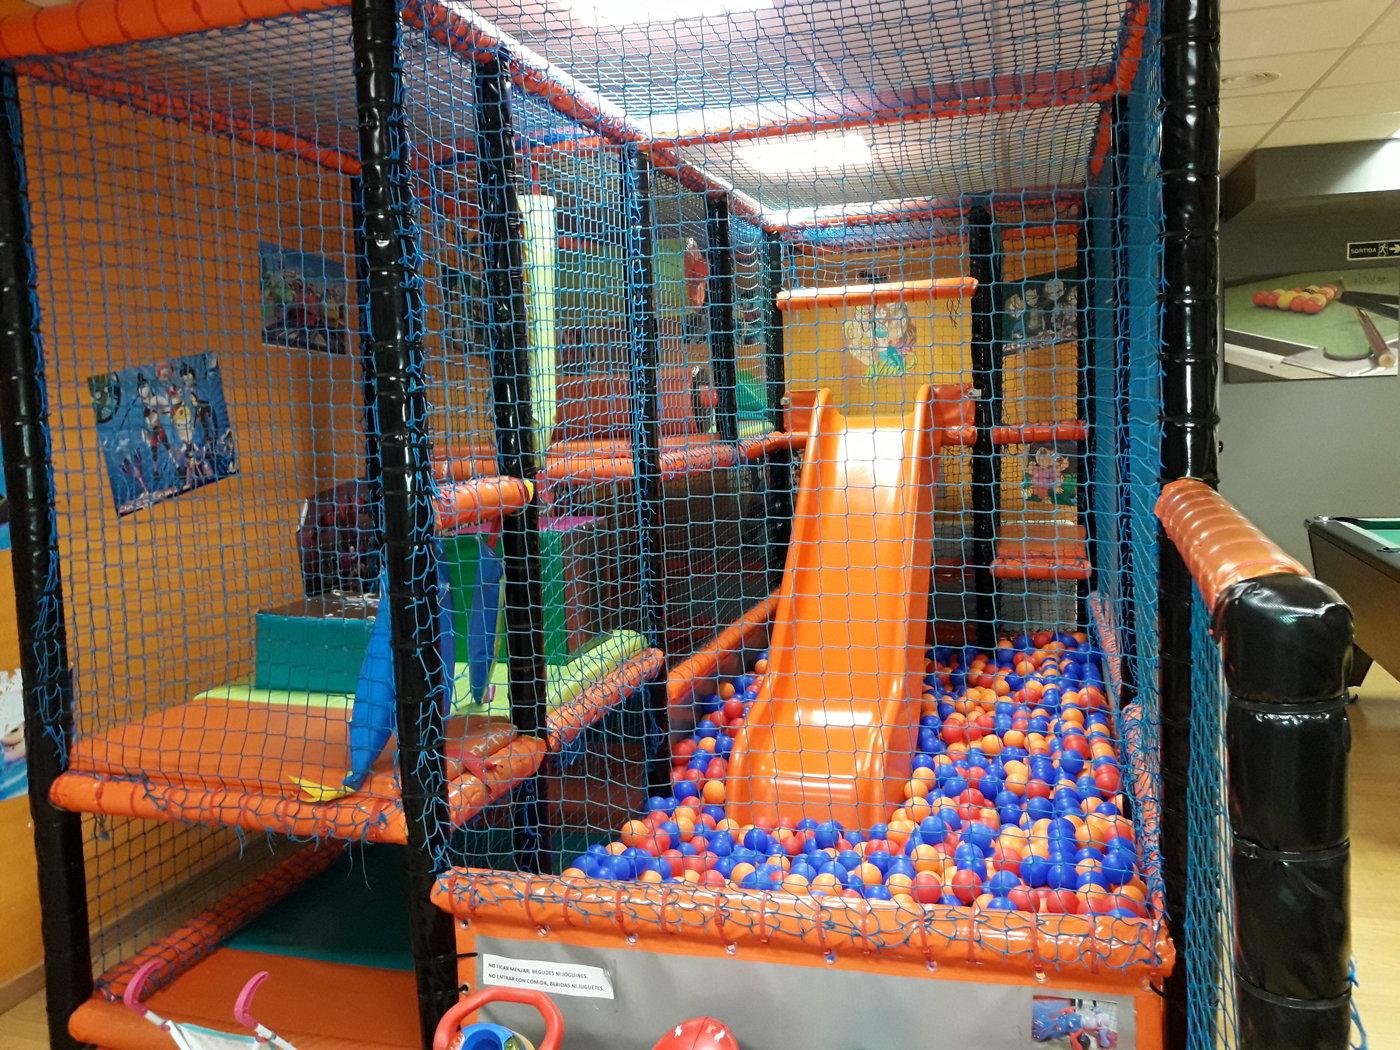 parque infantil en horta guinardo